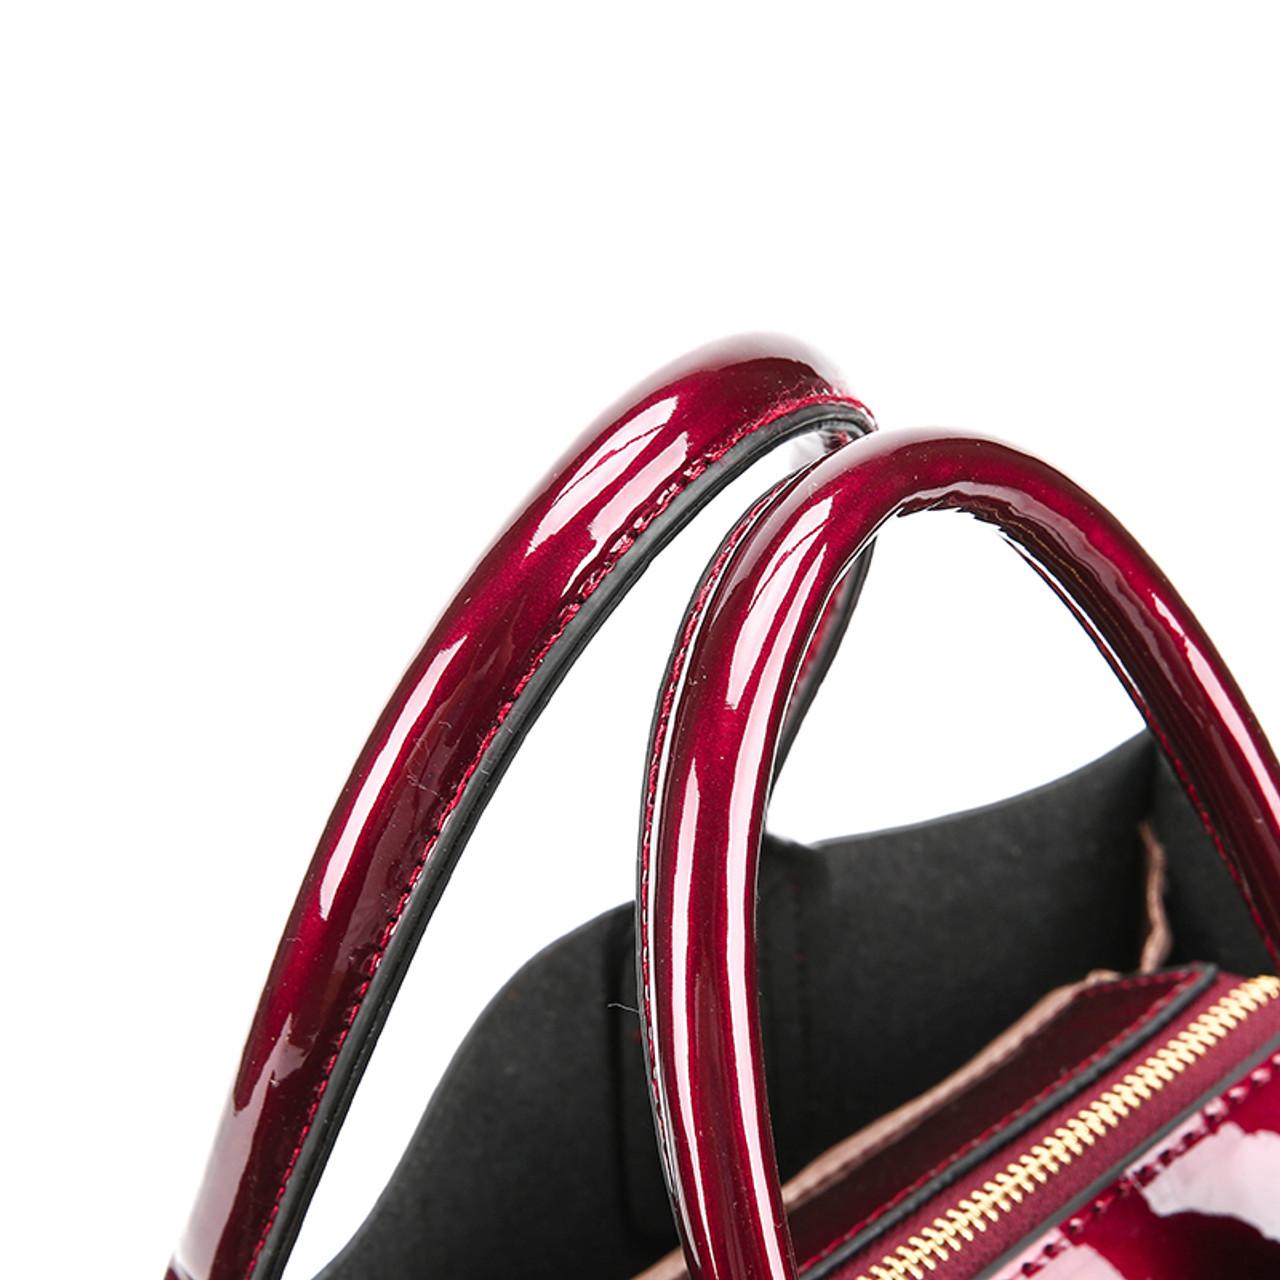 ... Bright Solid Patent Leather Women Fashion Bags Ladies Simple Luxury  Handbags Casual Shoulder Messenger Bags Sac ... 119f1e9e1b